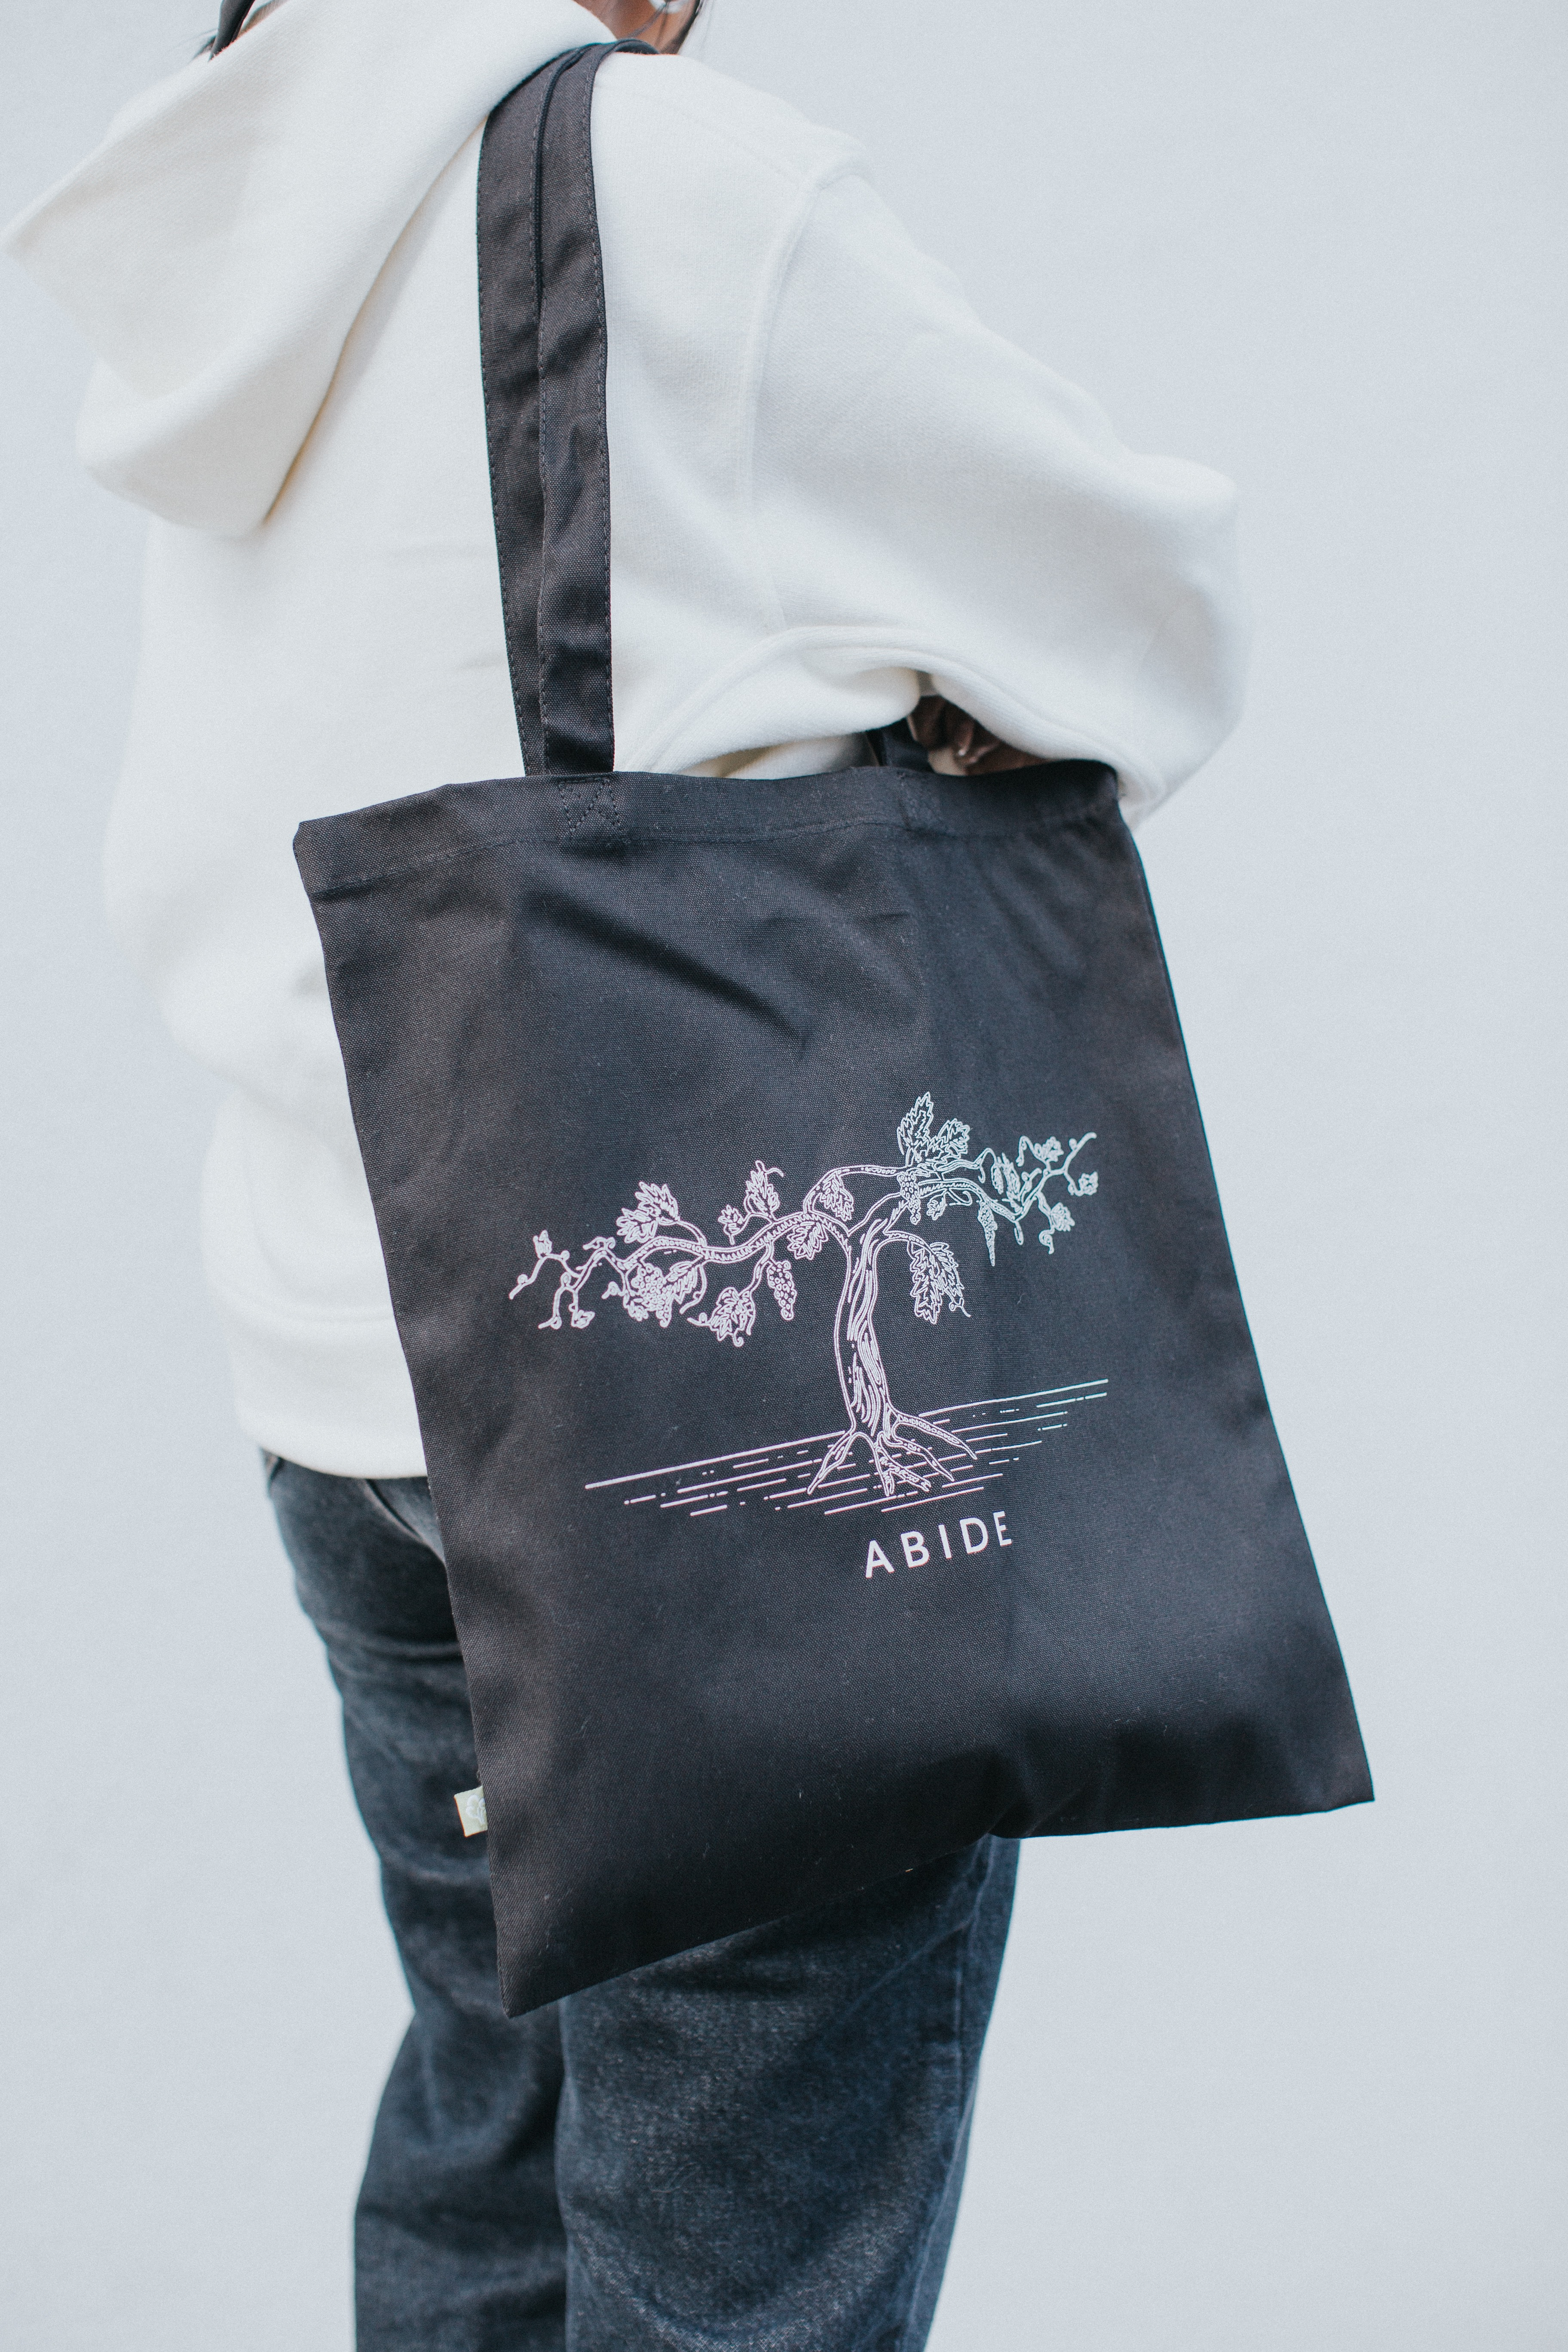 Might, Power < Spirit | Tote Bag (VS20)